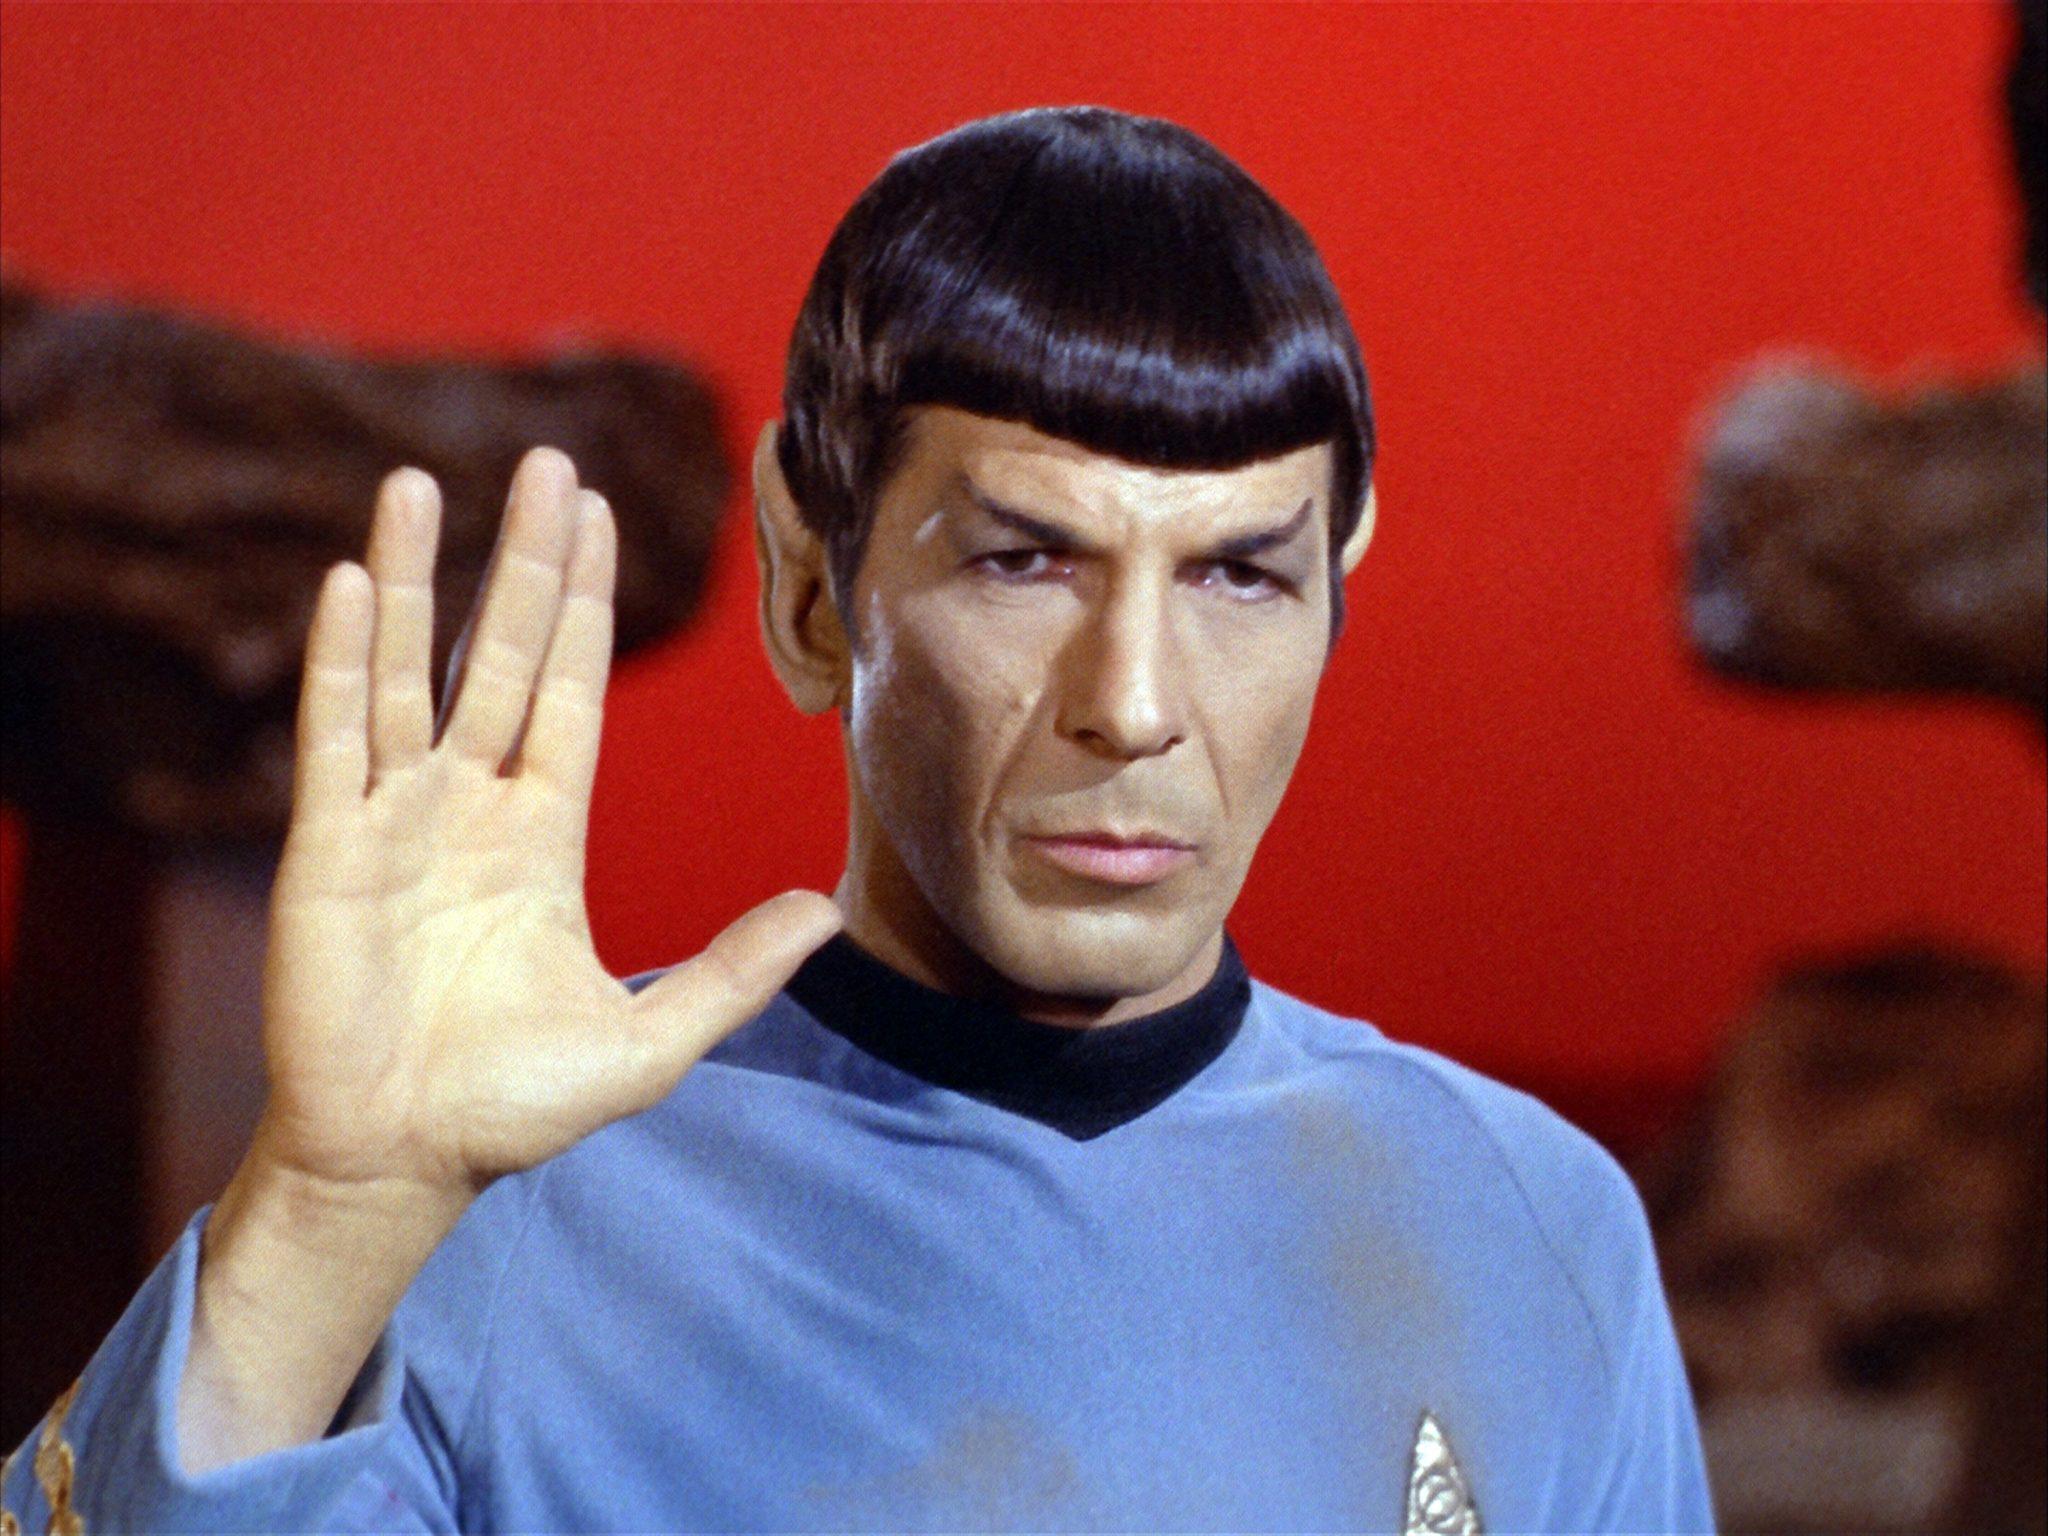 Star Trek: Exploring New Worlds Exhibition